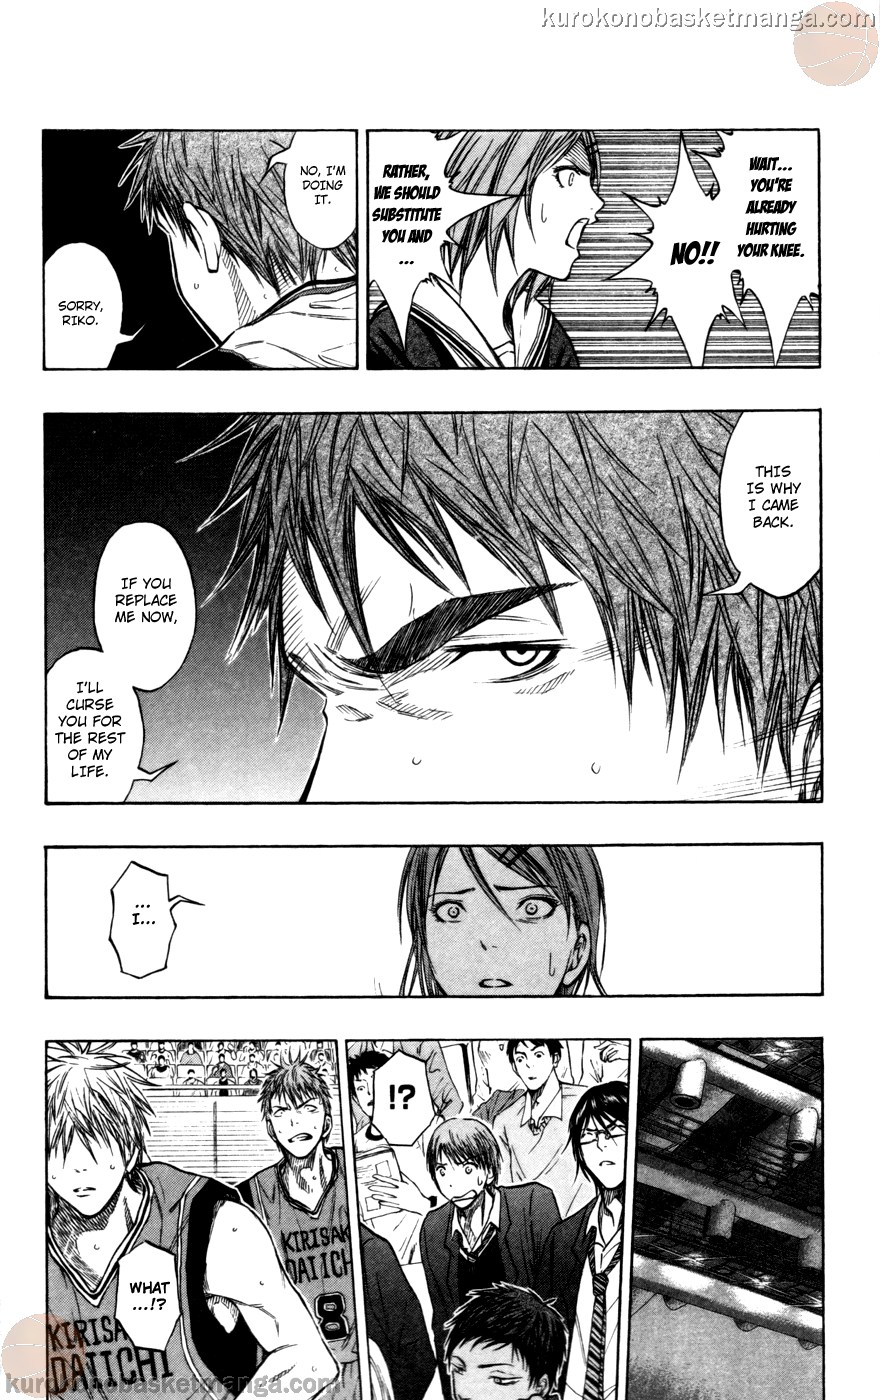 Kuroko no Basket Manga Chapter 102 - Image 08